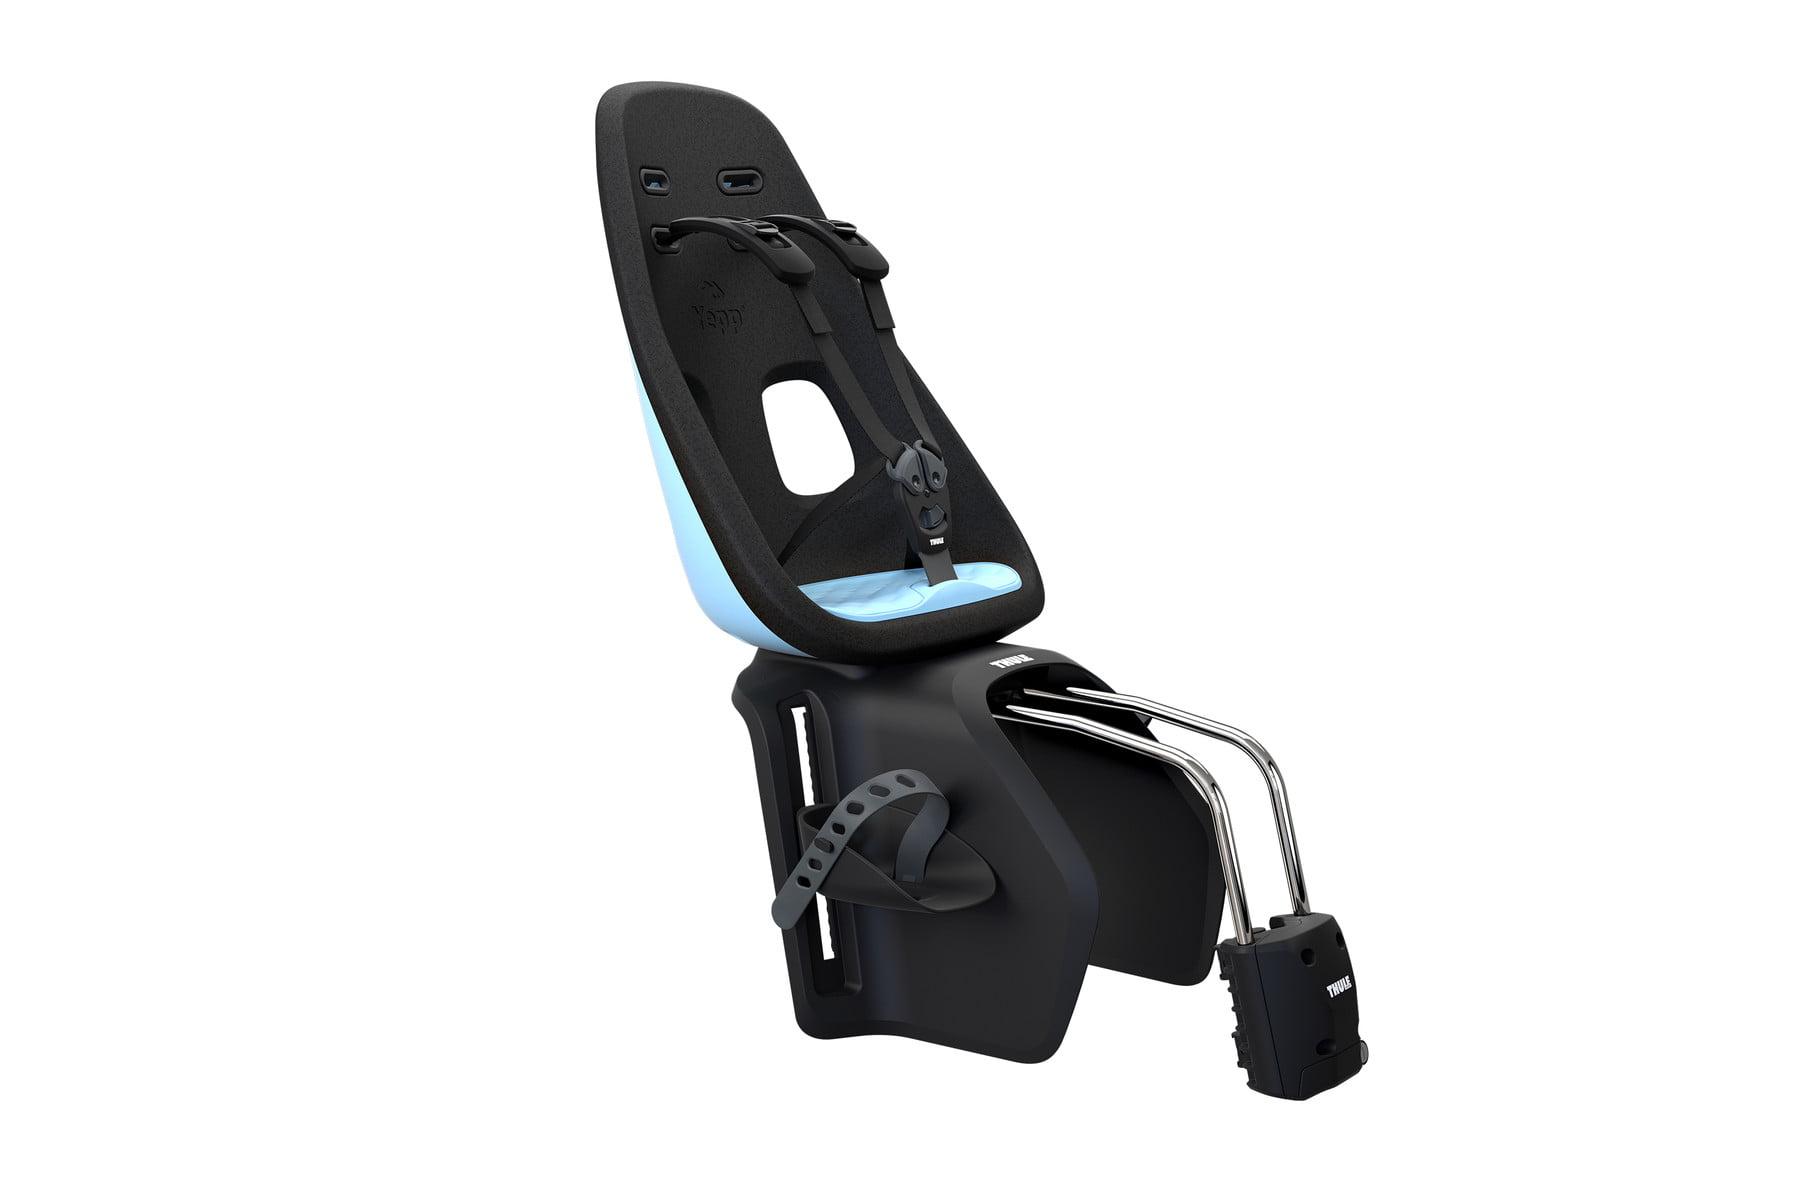 Scaun pentru copii cu montare pe cadrul bicicletei Thule Yepp Nexxt Maxi Aquamarine 1